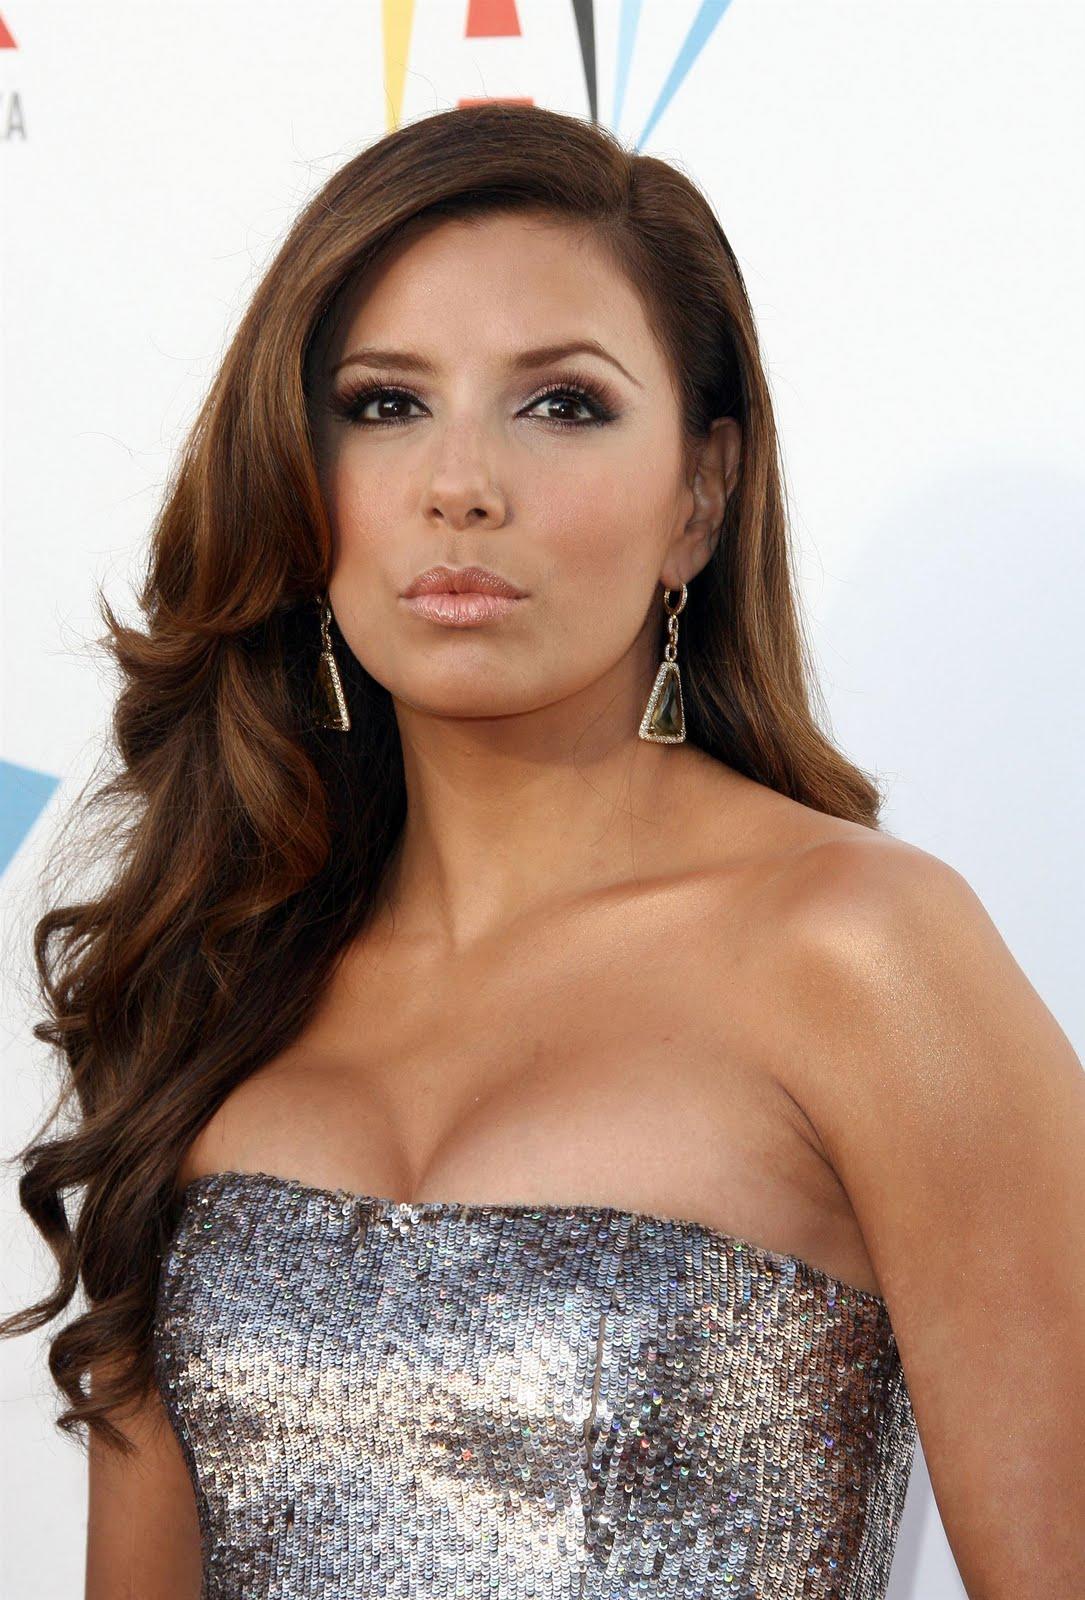 http://1.bp.blogspot.com/_eg7JvIinZrE/Swiw6wZTFPI/AAAAAAAALA0/3ZiRFmlBF0U/s1600/96330_celebrityheart.blogspot.com_7238_123_59lo.jpg